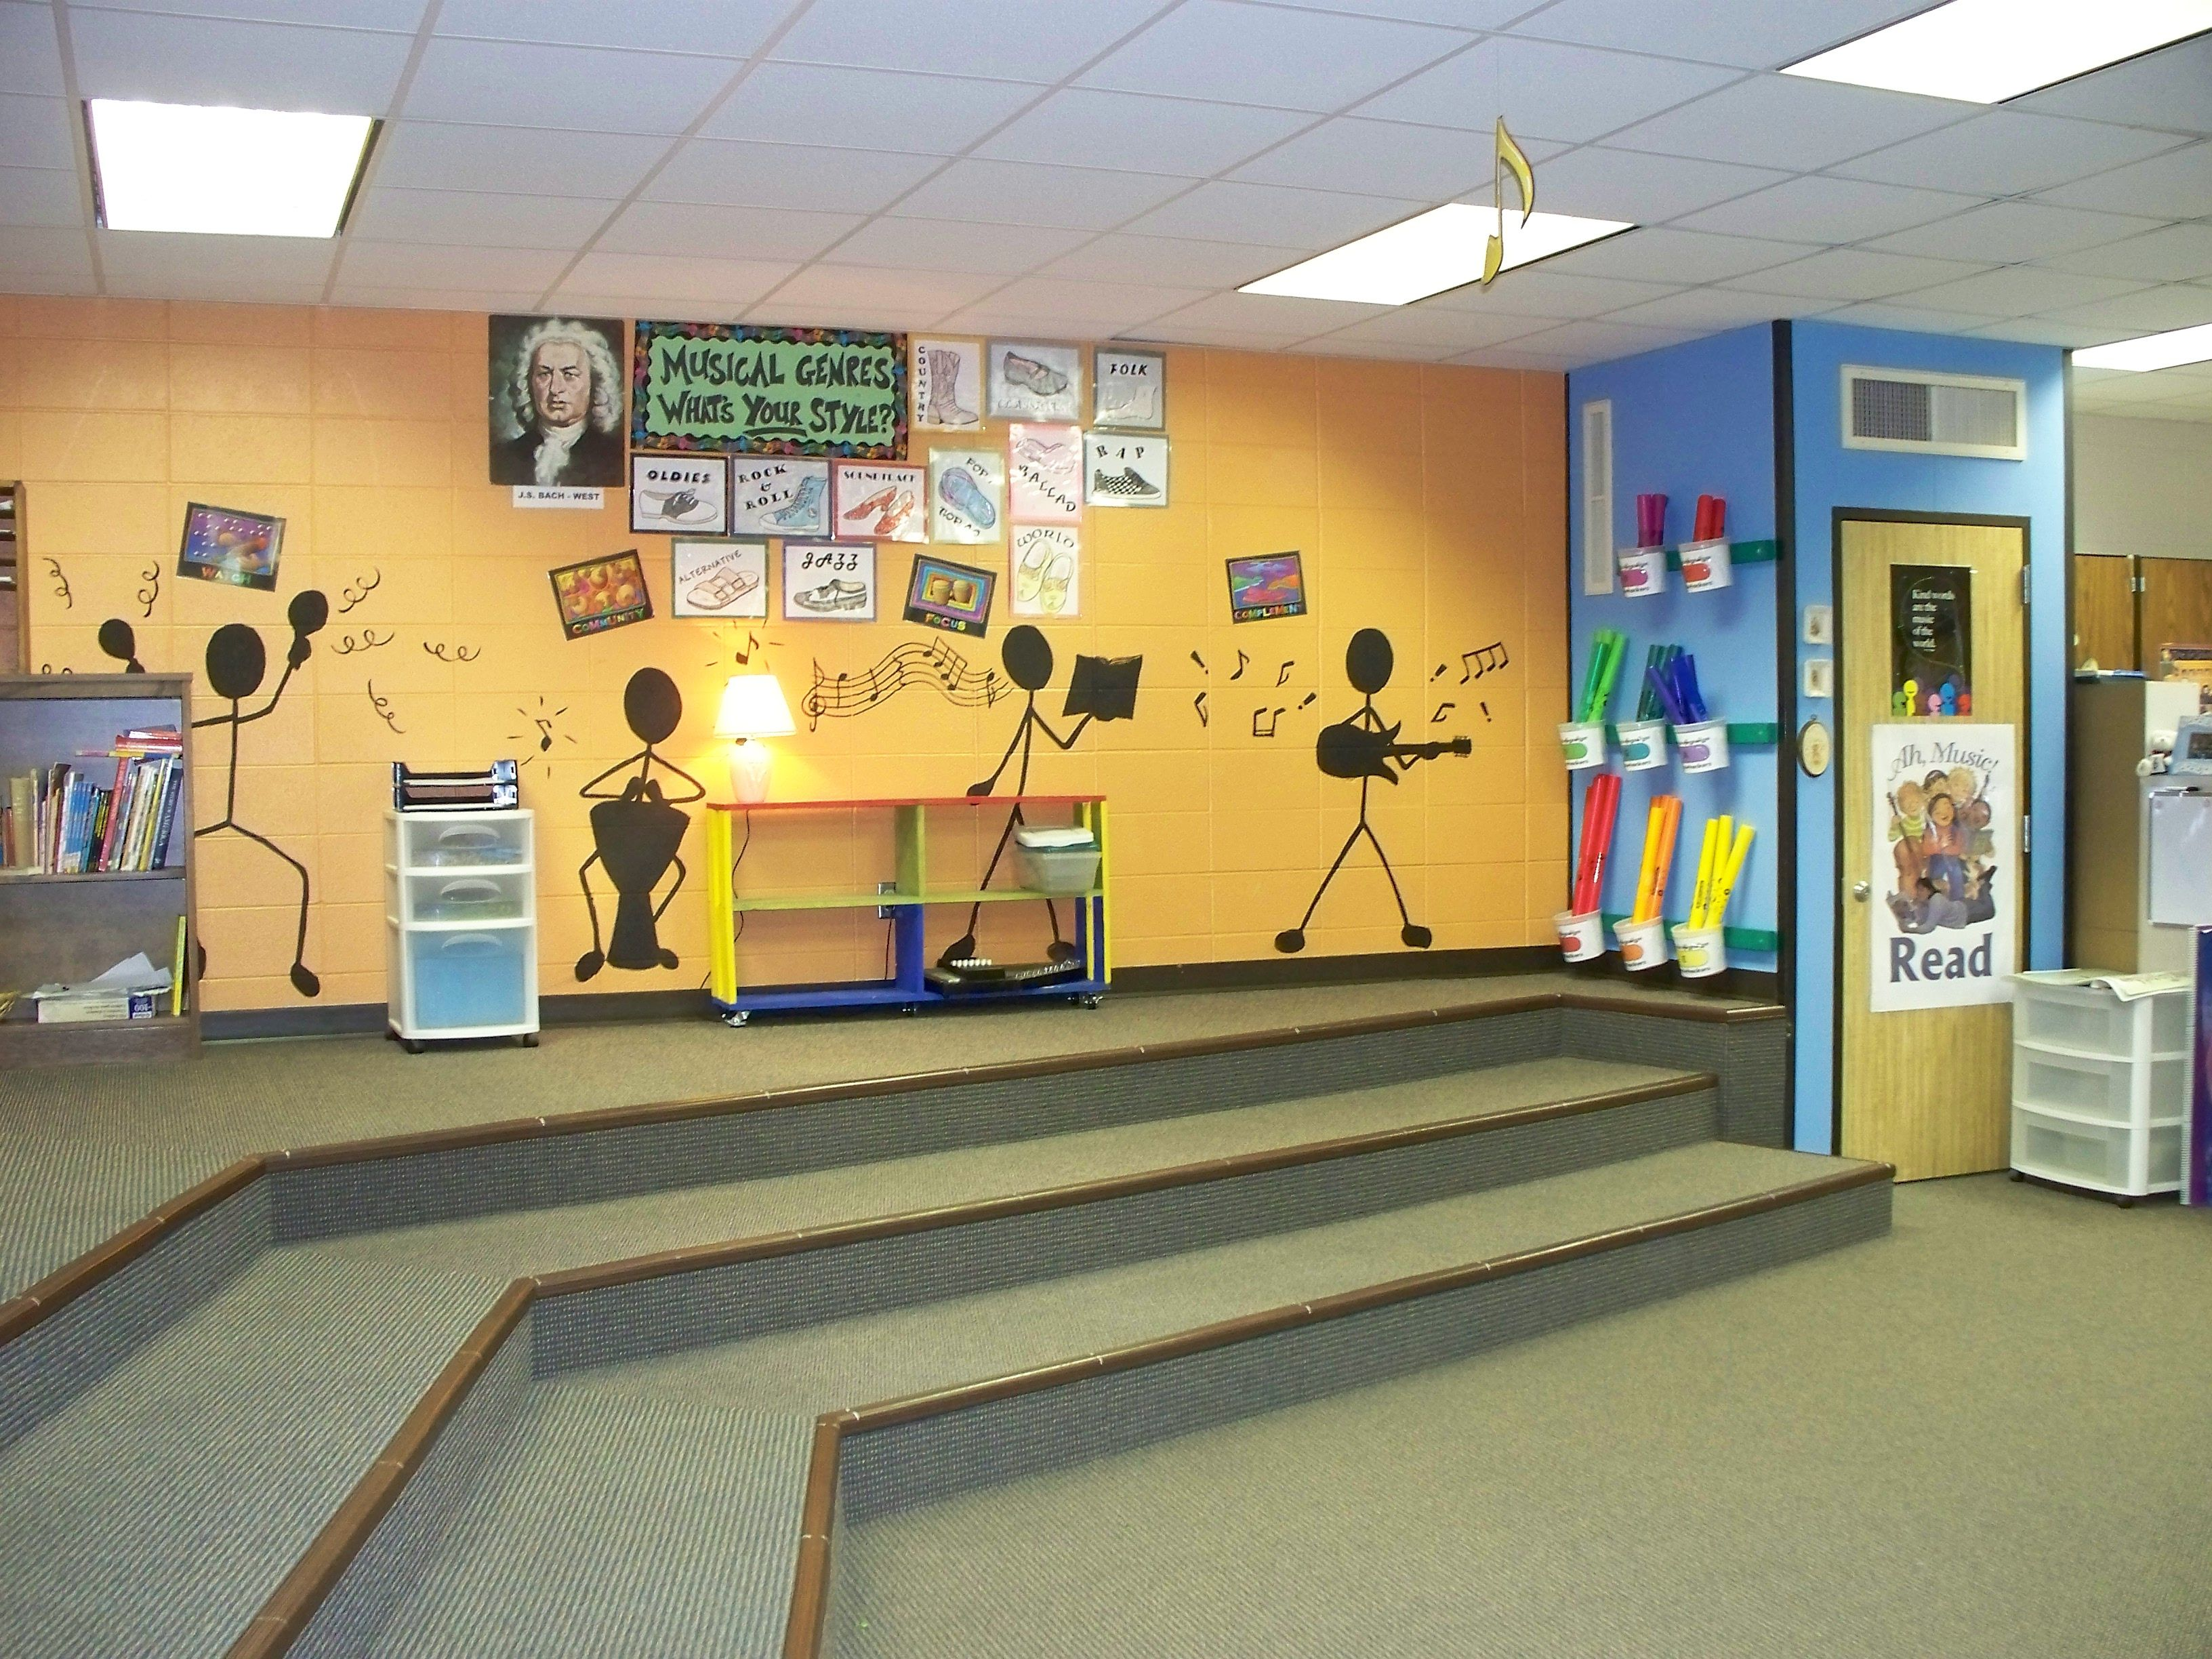 Music room organization idea